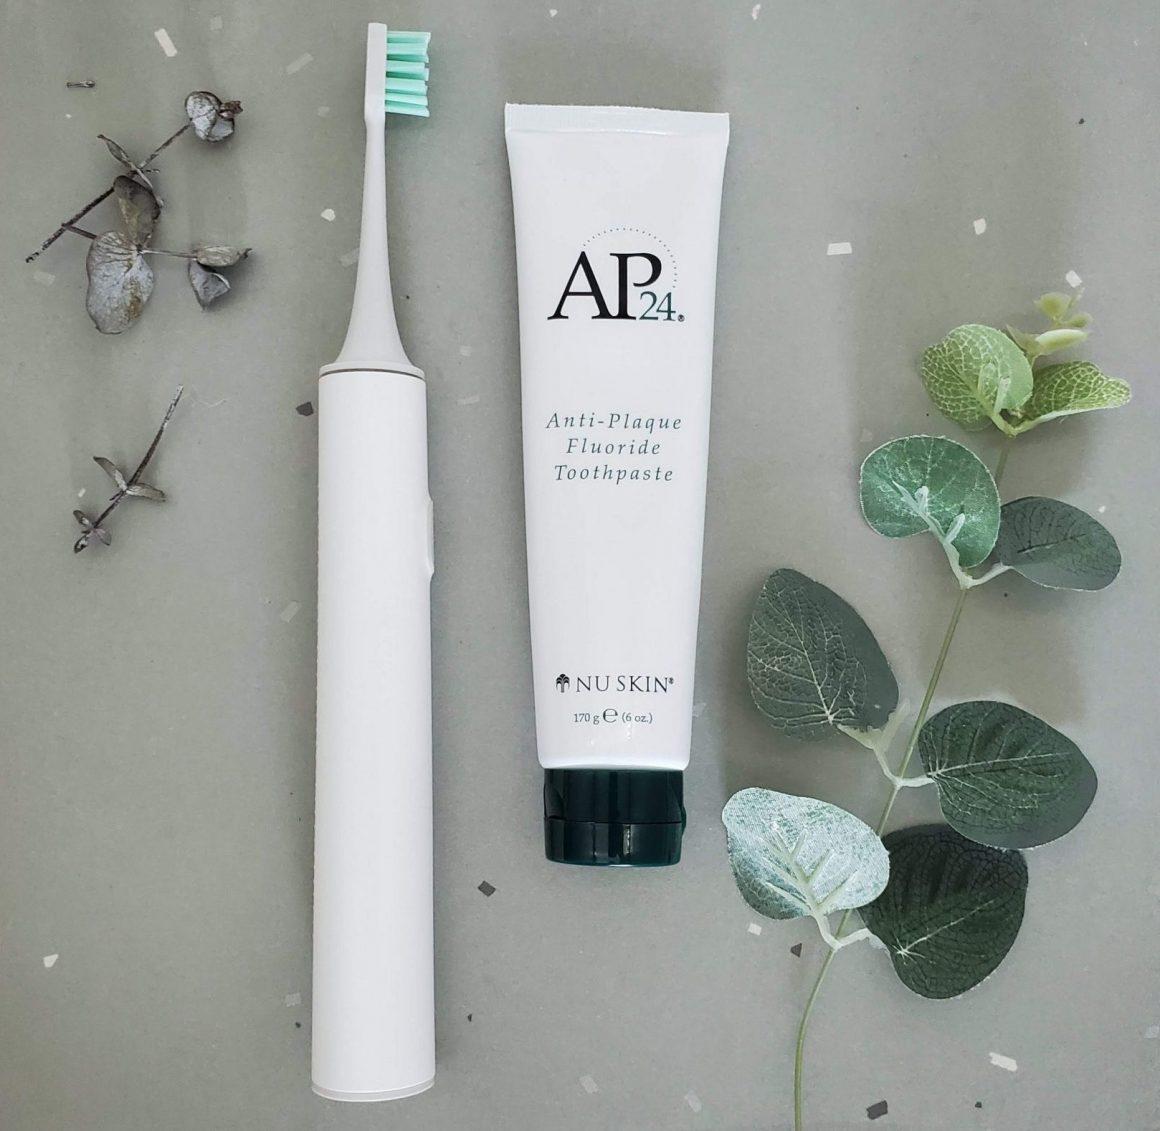 Nu Skin Whitening Toothpaste AP24: Review